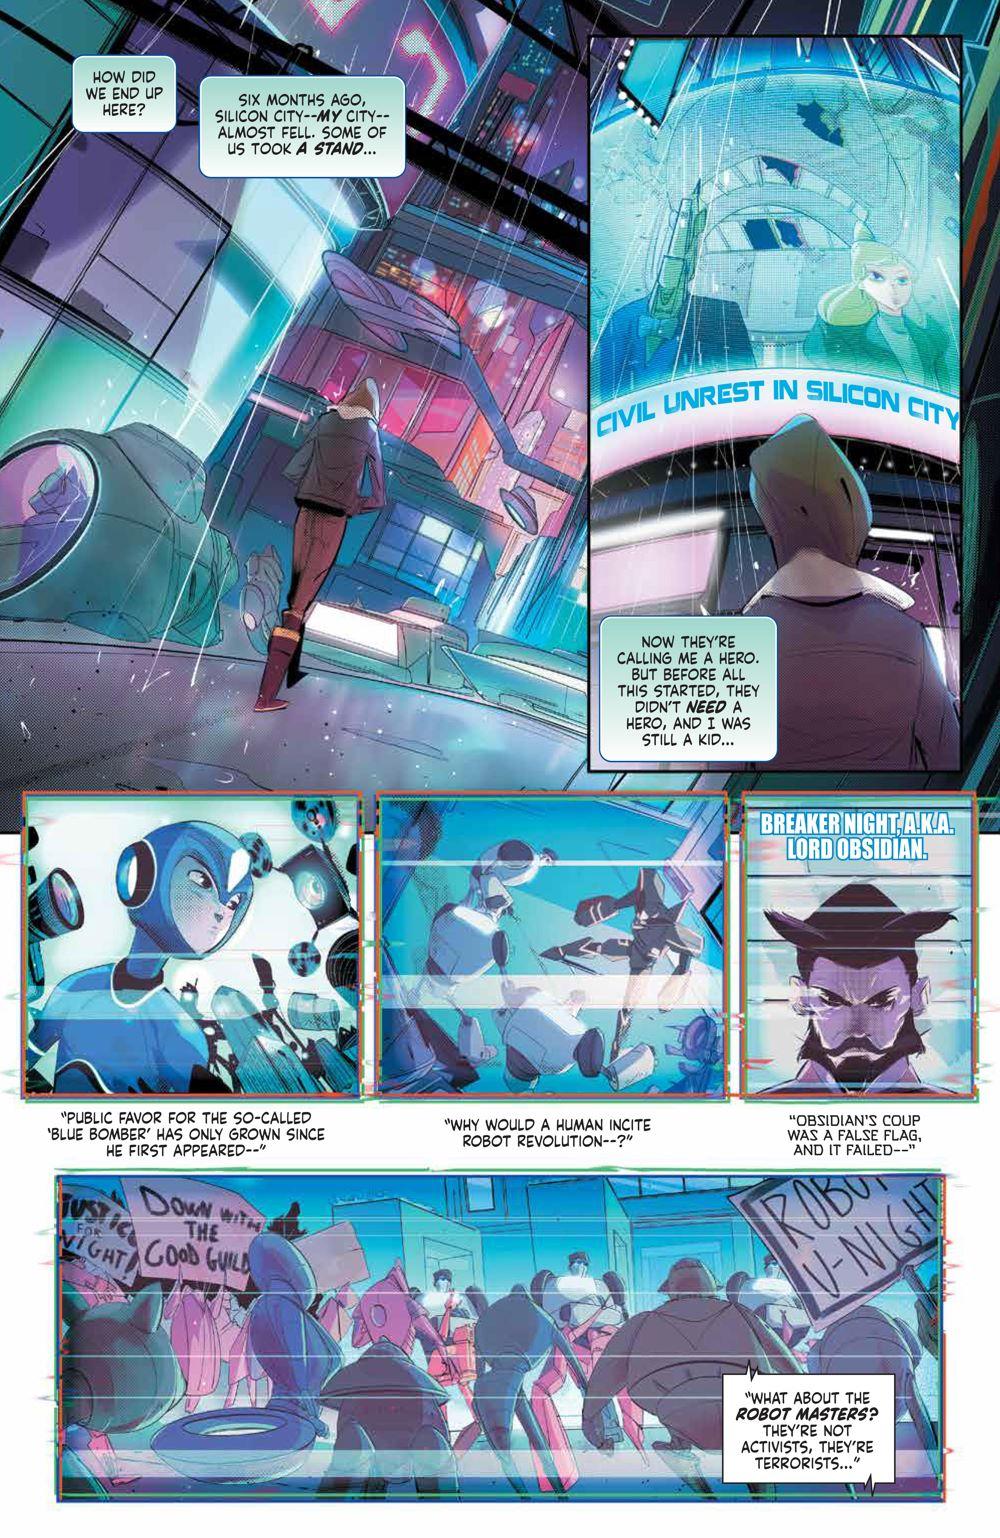 MegaMan_FullyCharged_001_PRESS_3 ComicList Previews: MEGA MAN FULLY CHARGED #1